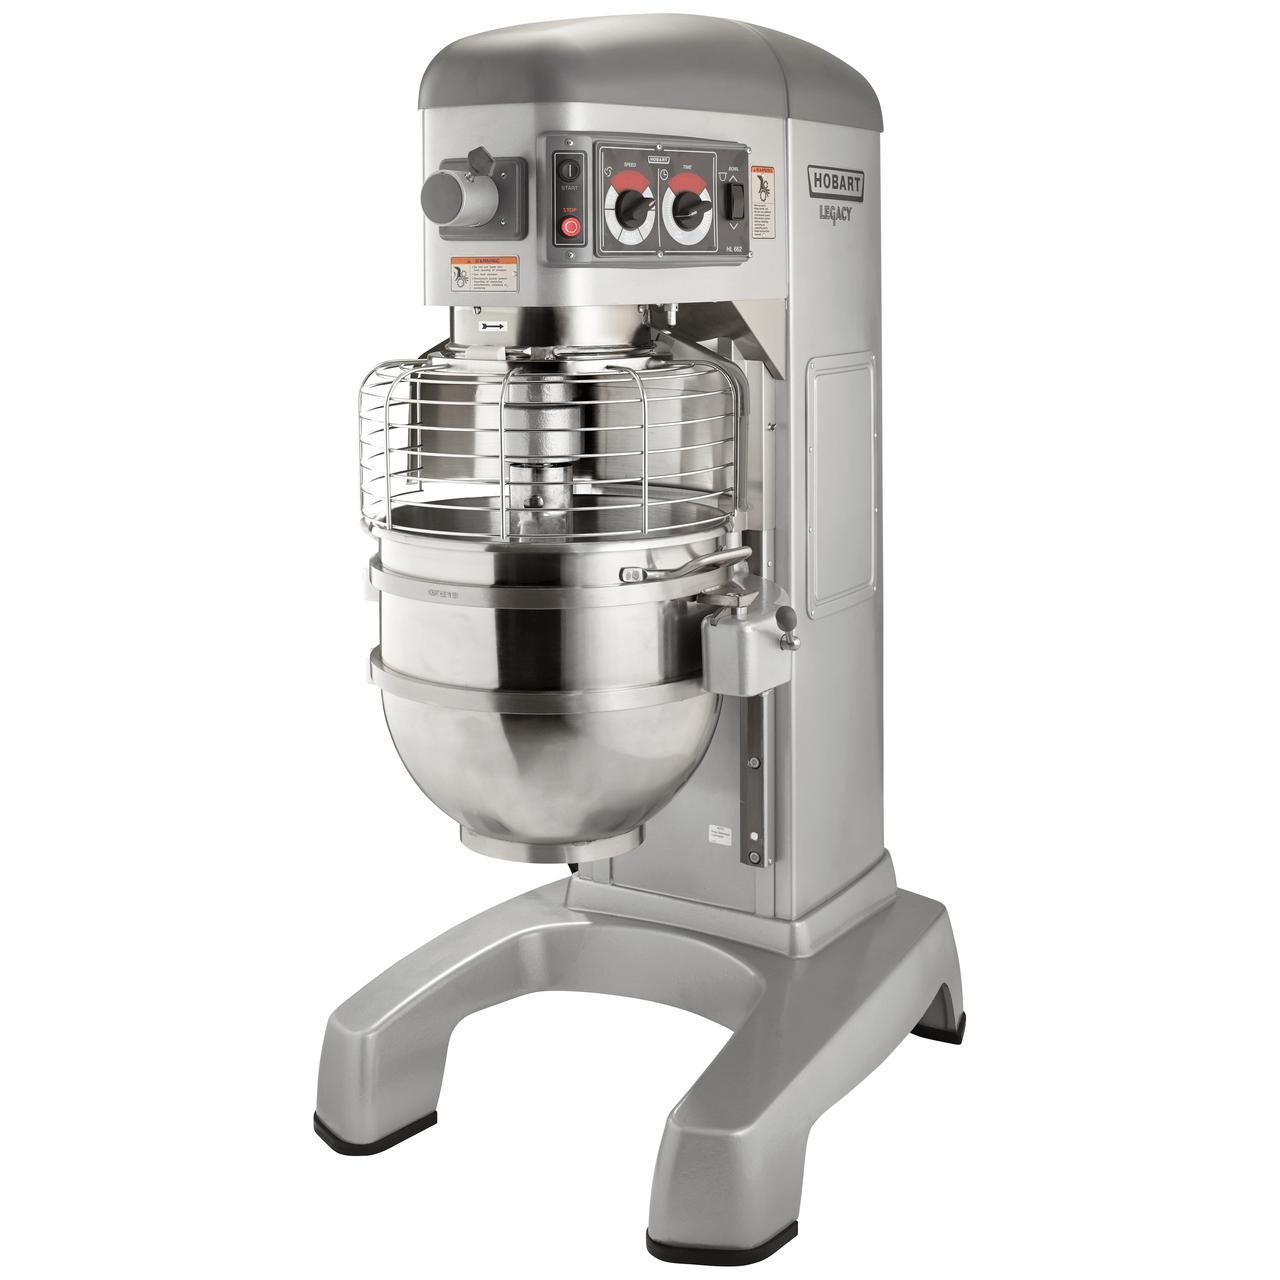 medium resolution of pizza dough mixer commercial pizza mixer hobartdough mixer wiring diagram 8